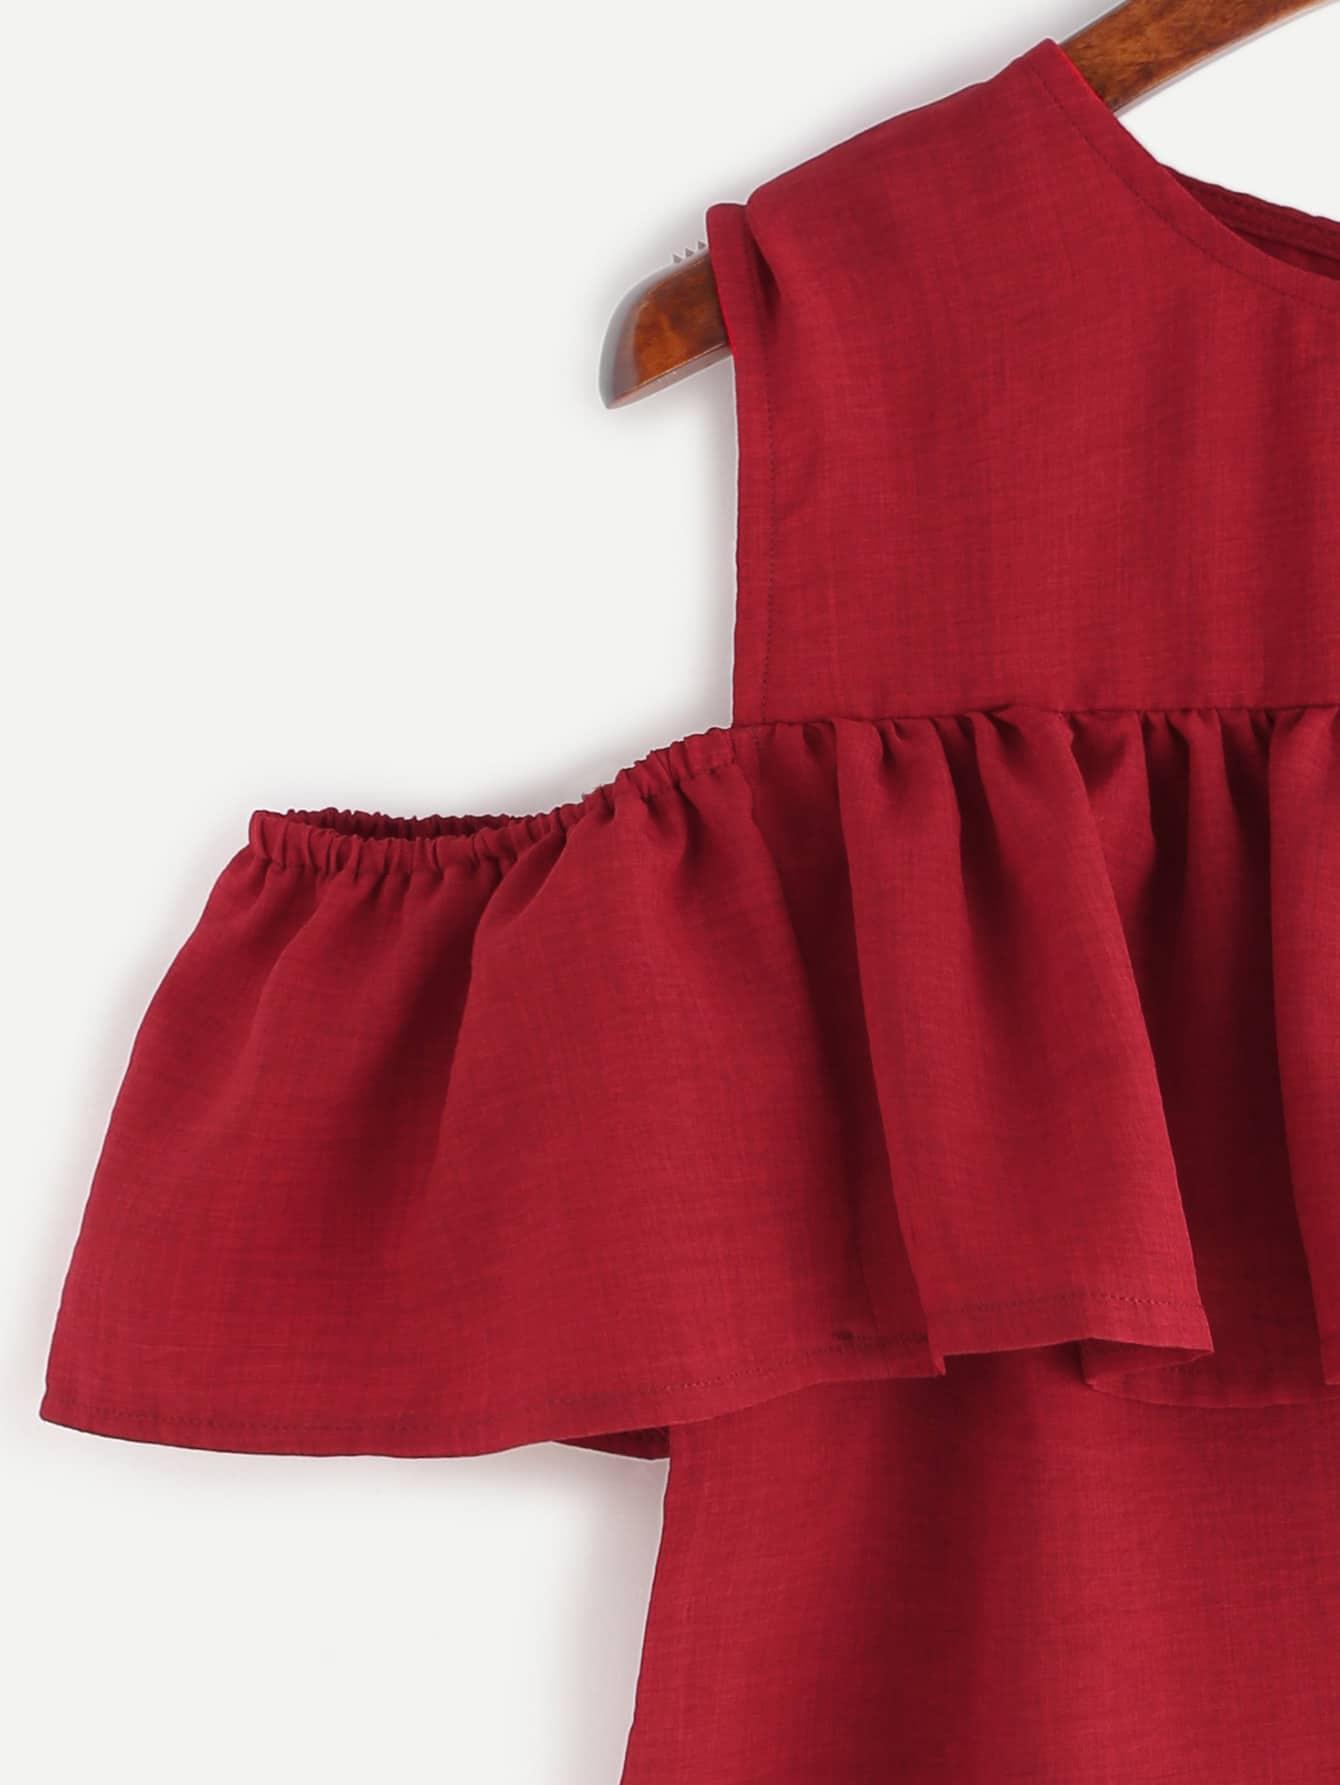 blouse160819122_2